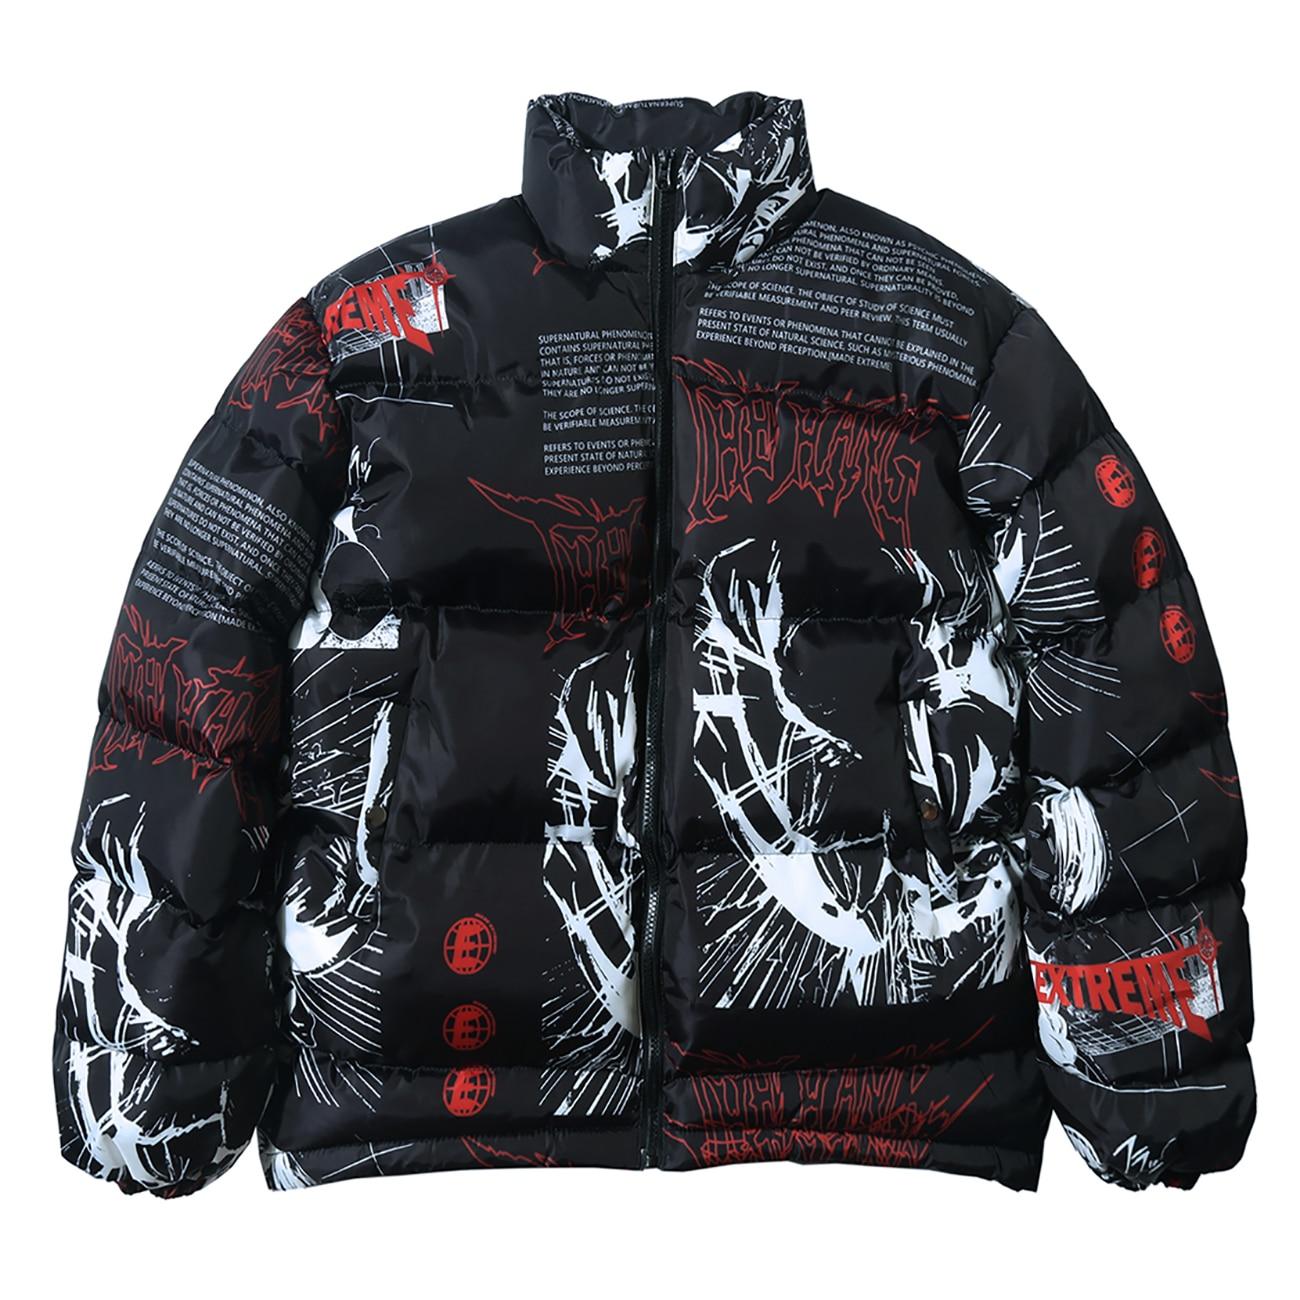 Down Jacket Japanese Cartoon Graffiti Print Men Thick Parka Winter Warm Padded Jacket Coats 2020 Harajuku Windbreaker Streetwear